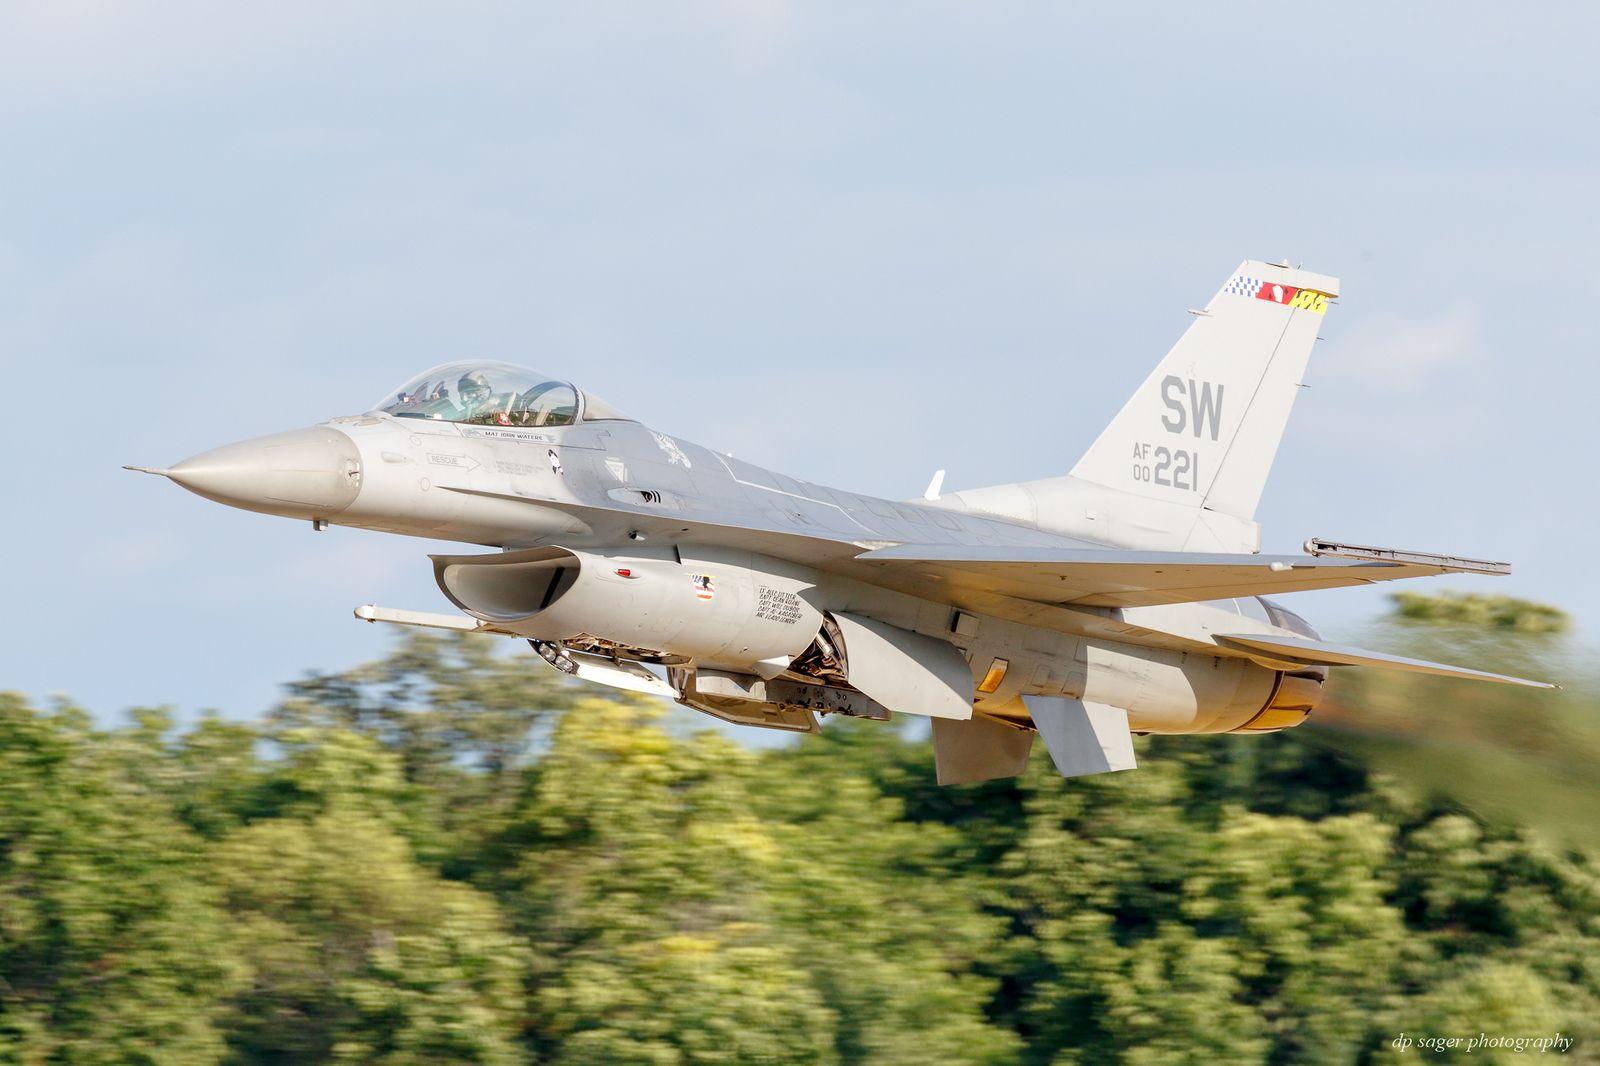 Warbirds at Oshkosh Air show, Fighter jets, Instagram